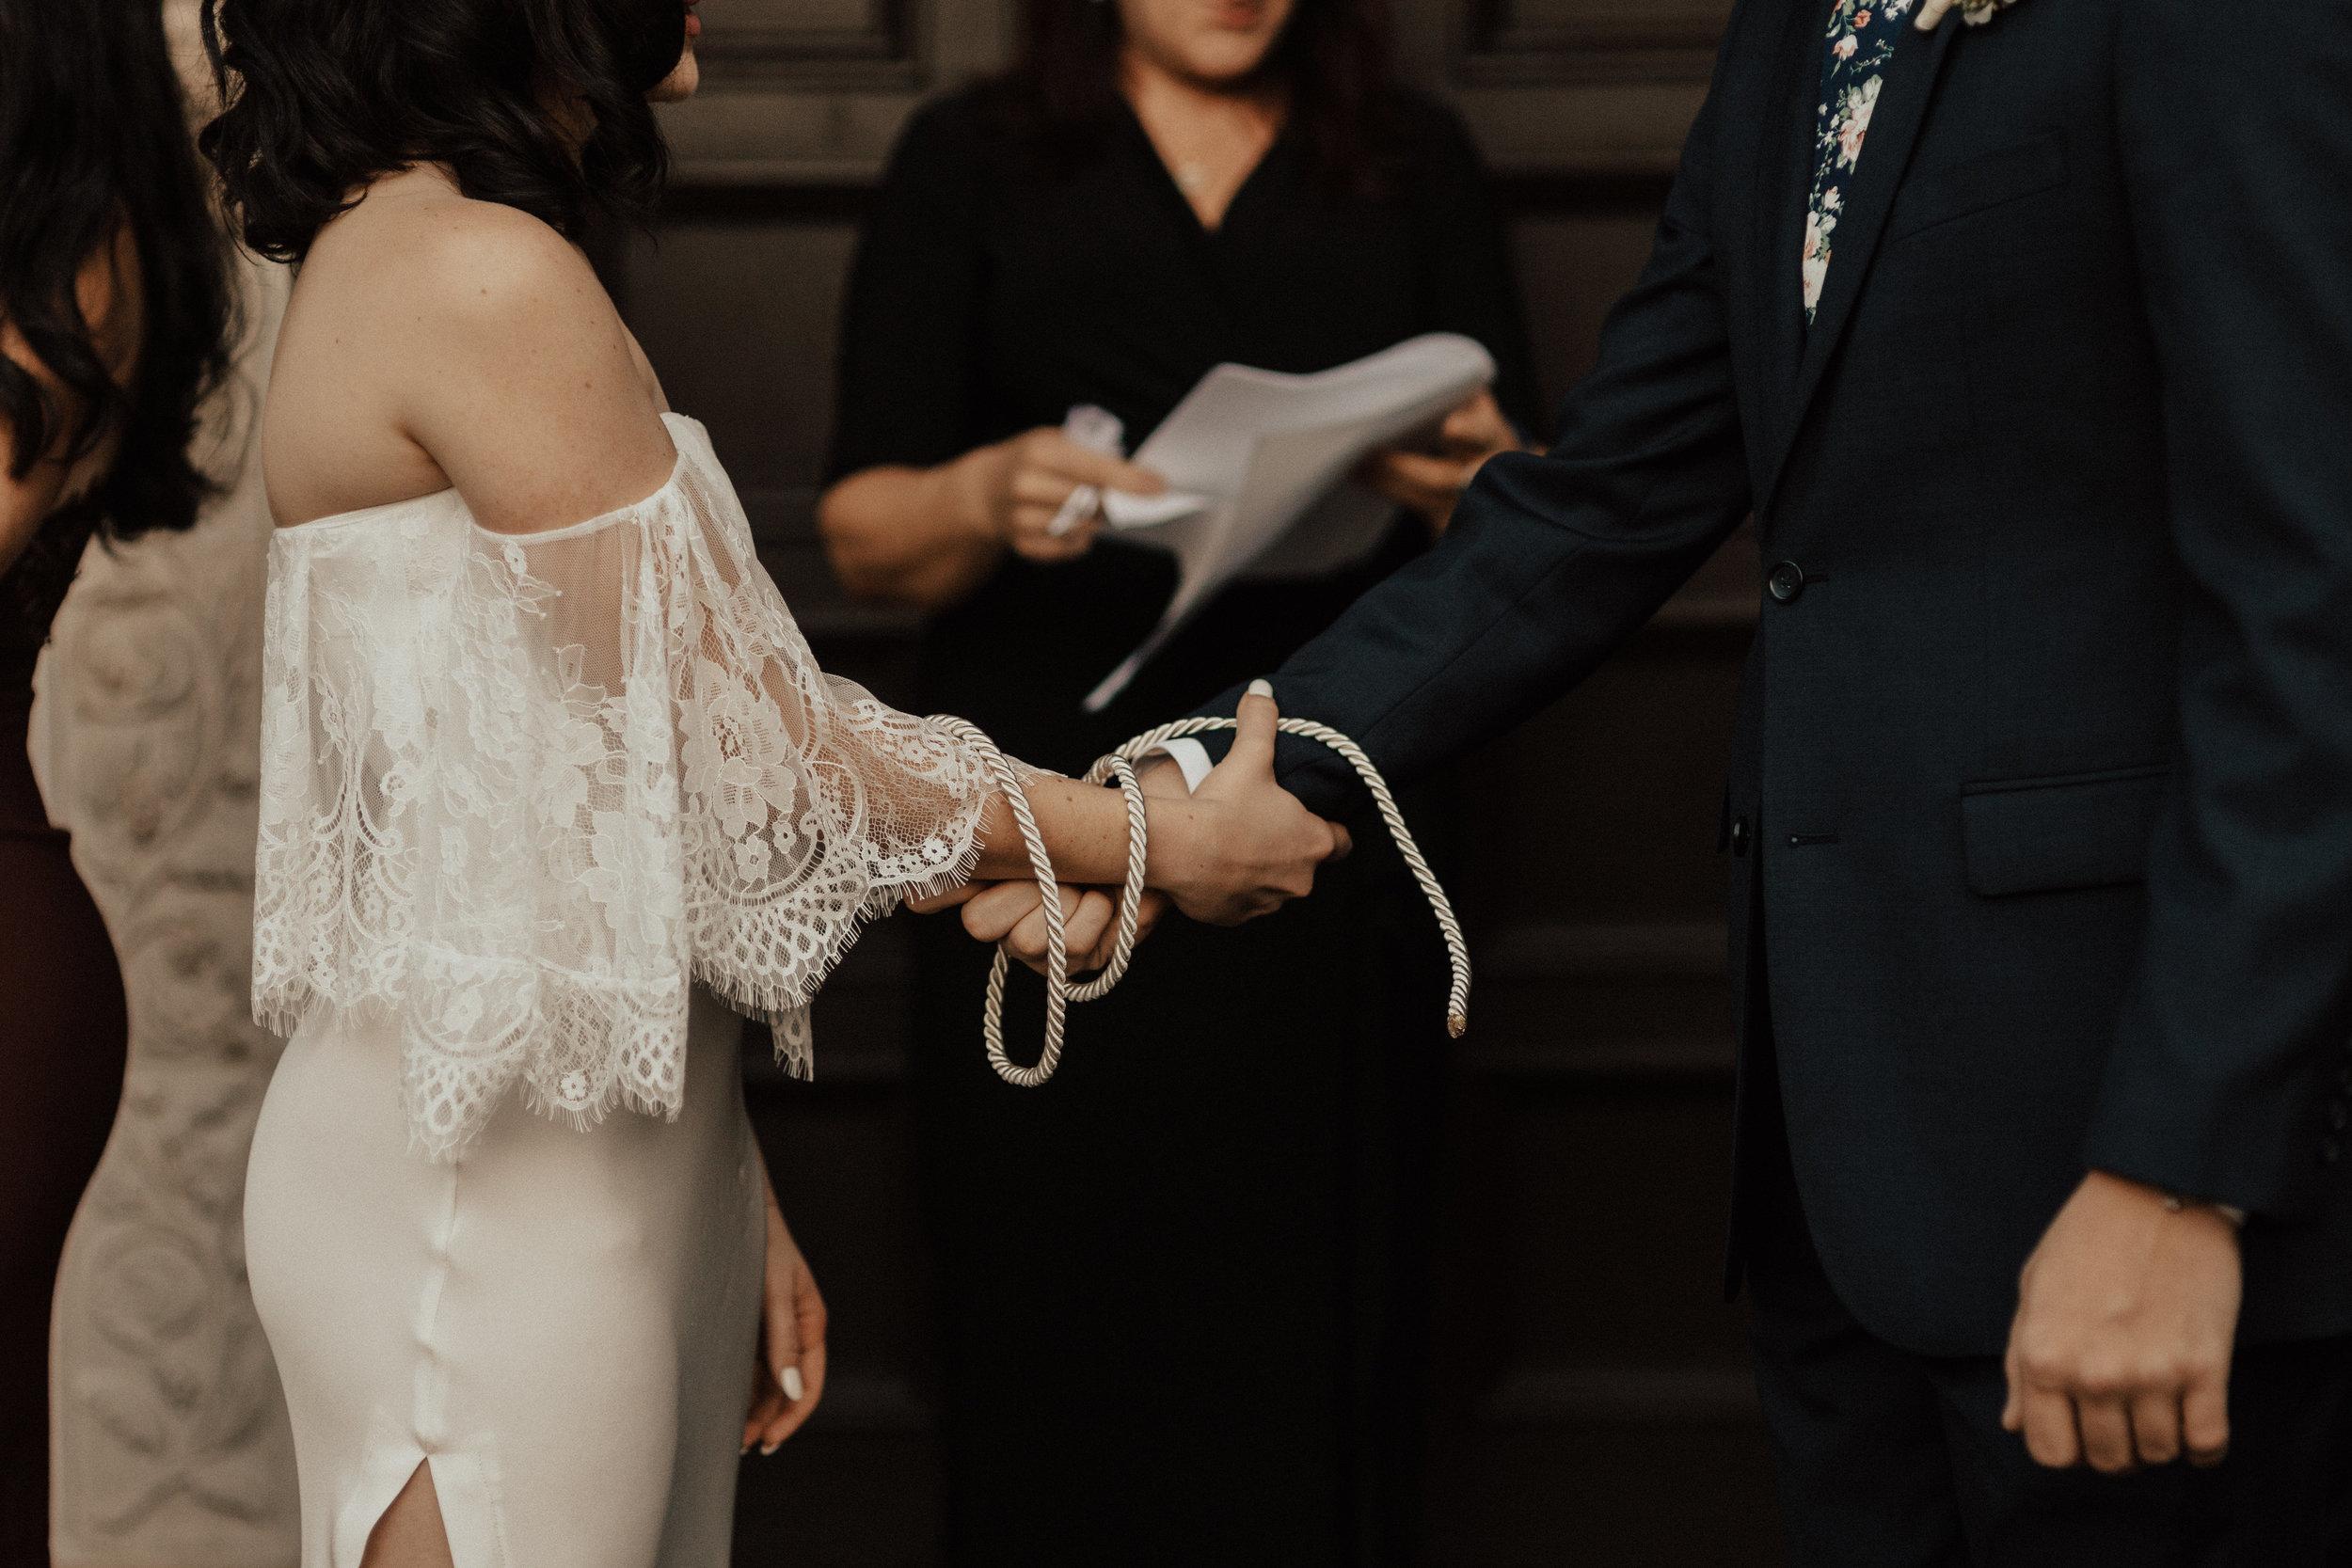 Orlando Wedding Planner Blue Ribbon Weddings  Photography Ardency & Arrow Photography  Wedding Venue: Casa Feliz Winter Park